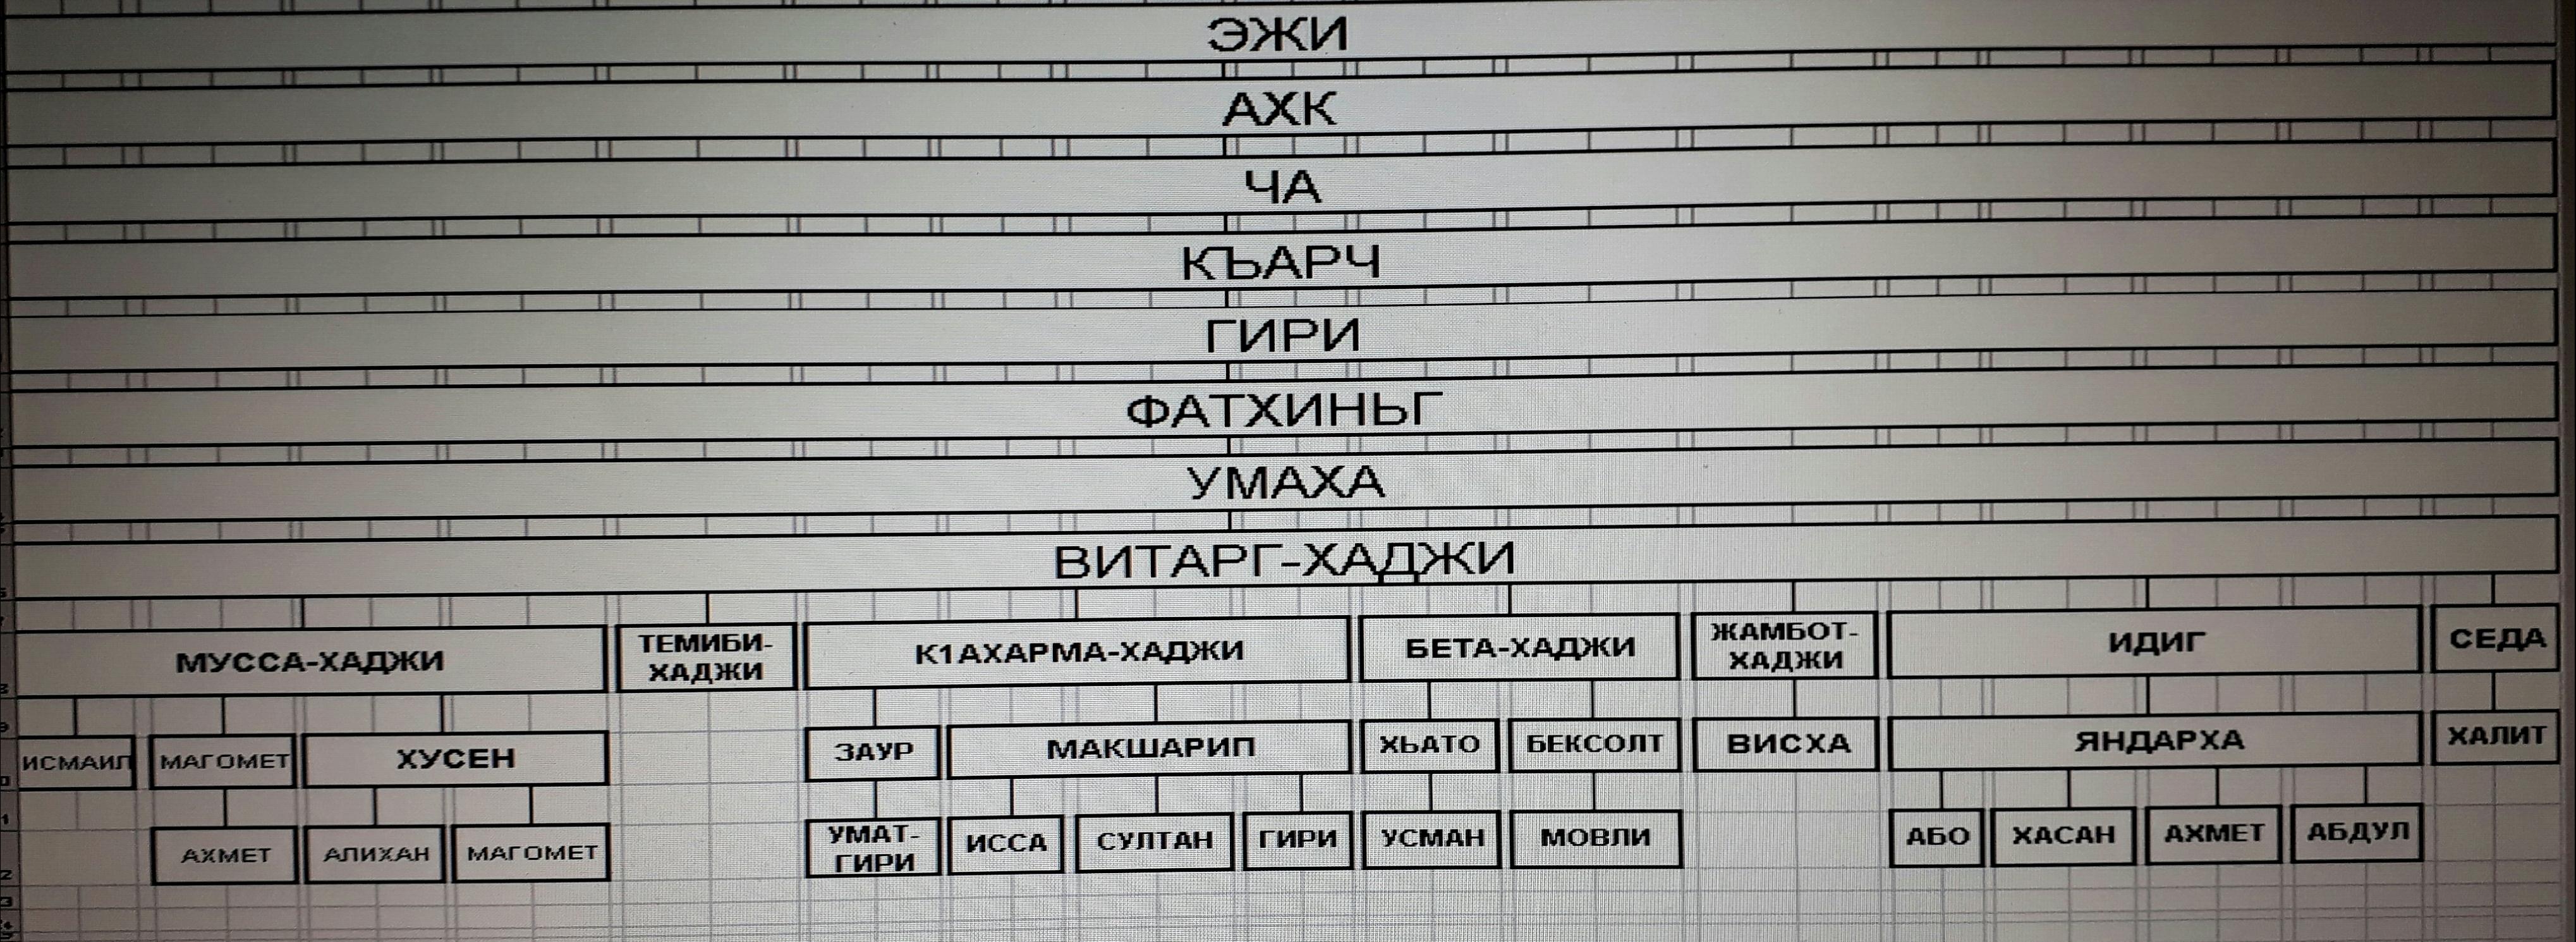 http://se.uploads.ru/S5CyI.jpg